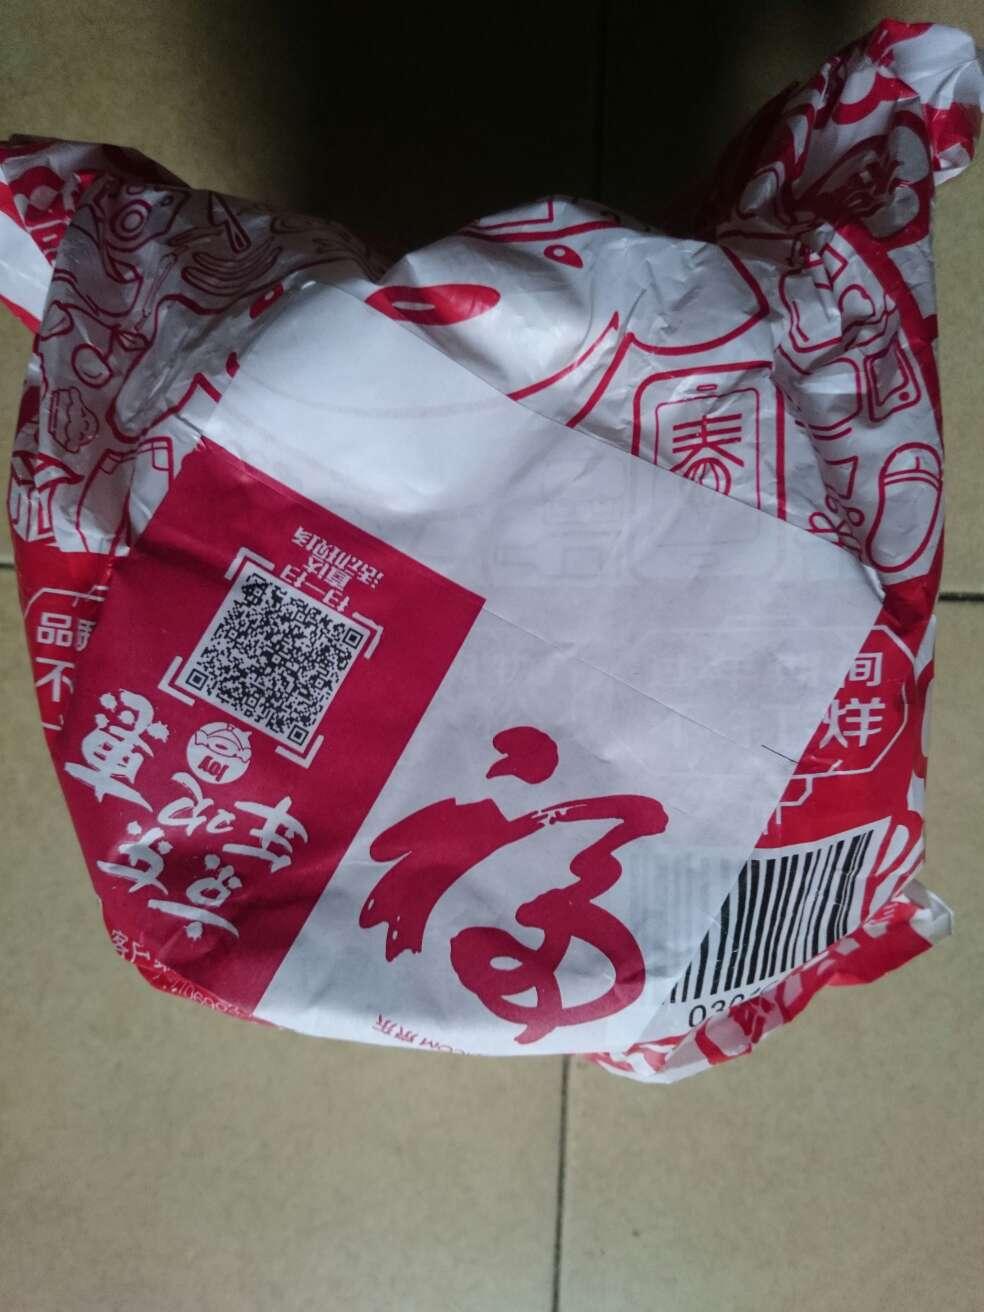 mens free run 2014 00240072 bags